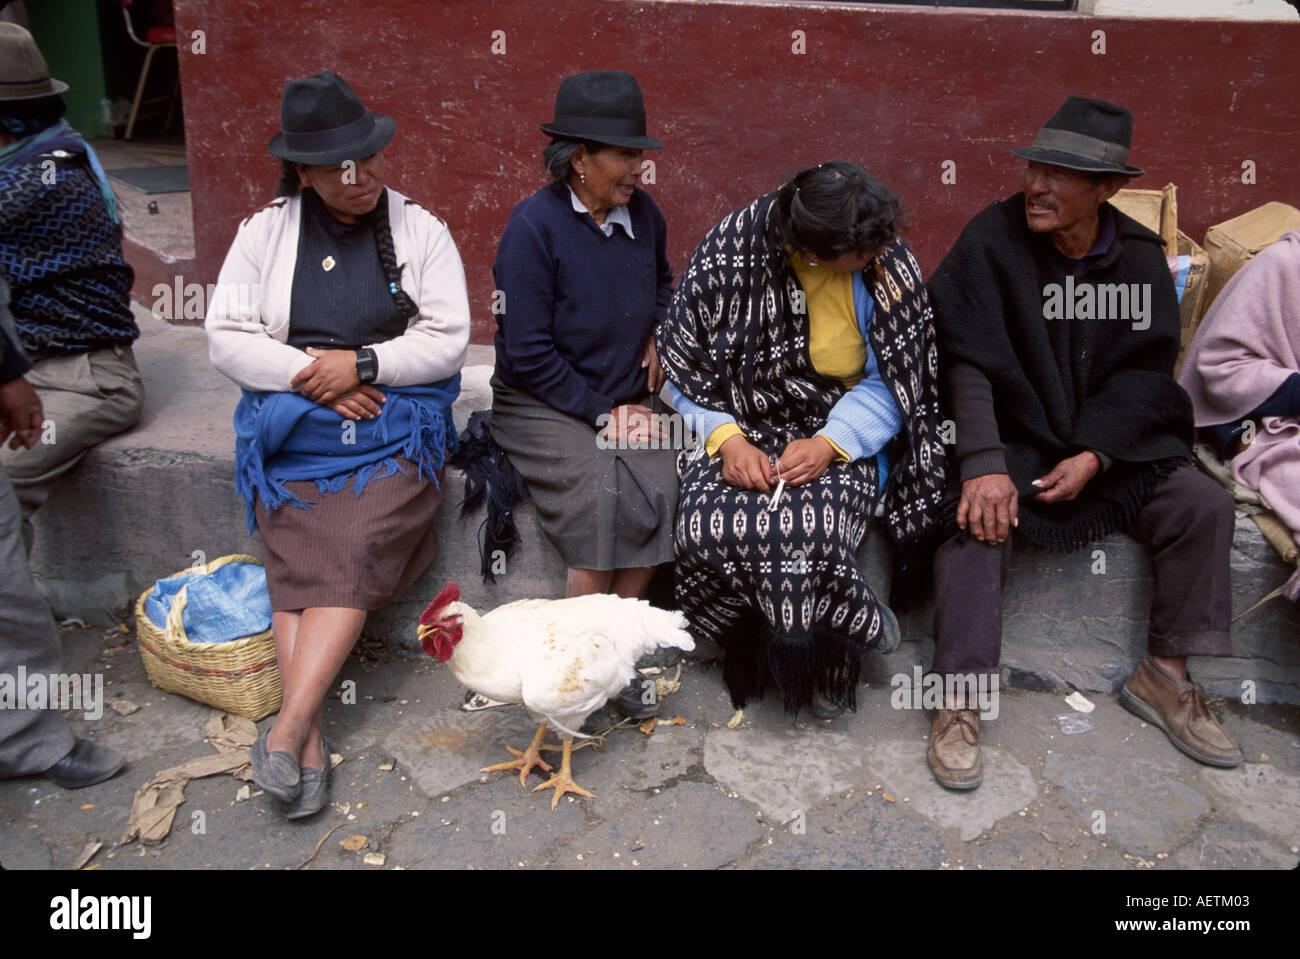 Mercado de Saquisilí Ecuador Otavalo Cotopaxi Chibuleos indígenas mujer  hombre pollo sombreros Imagen De Stock 6c1026d005f